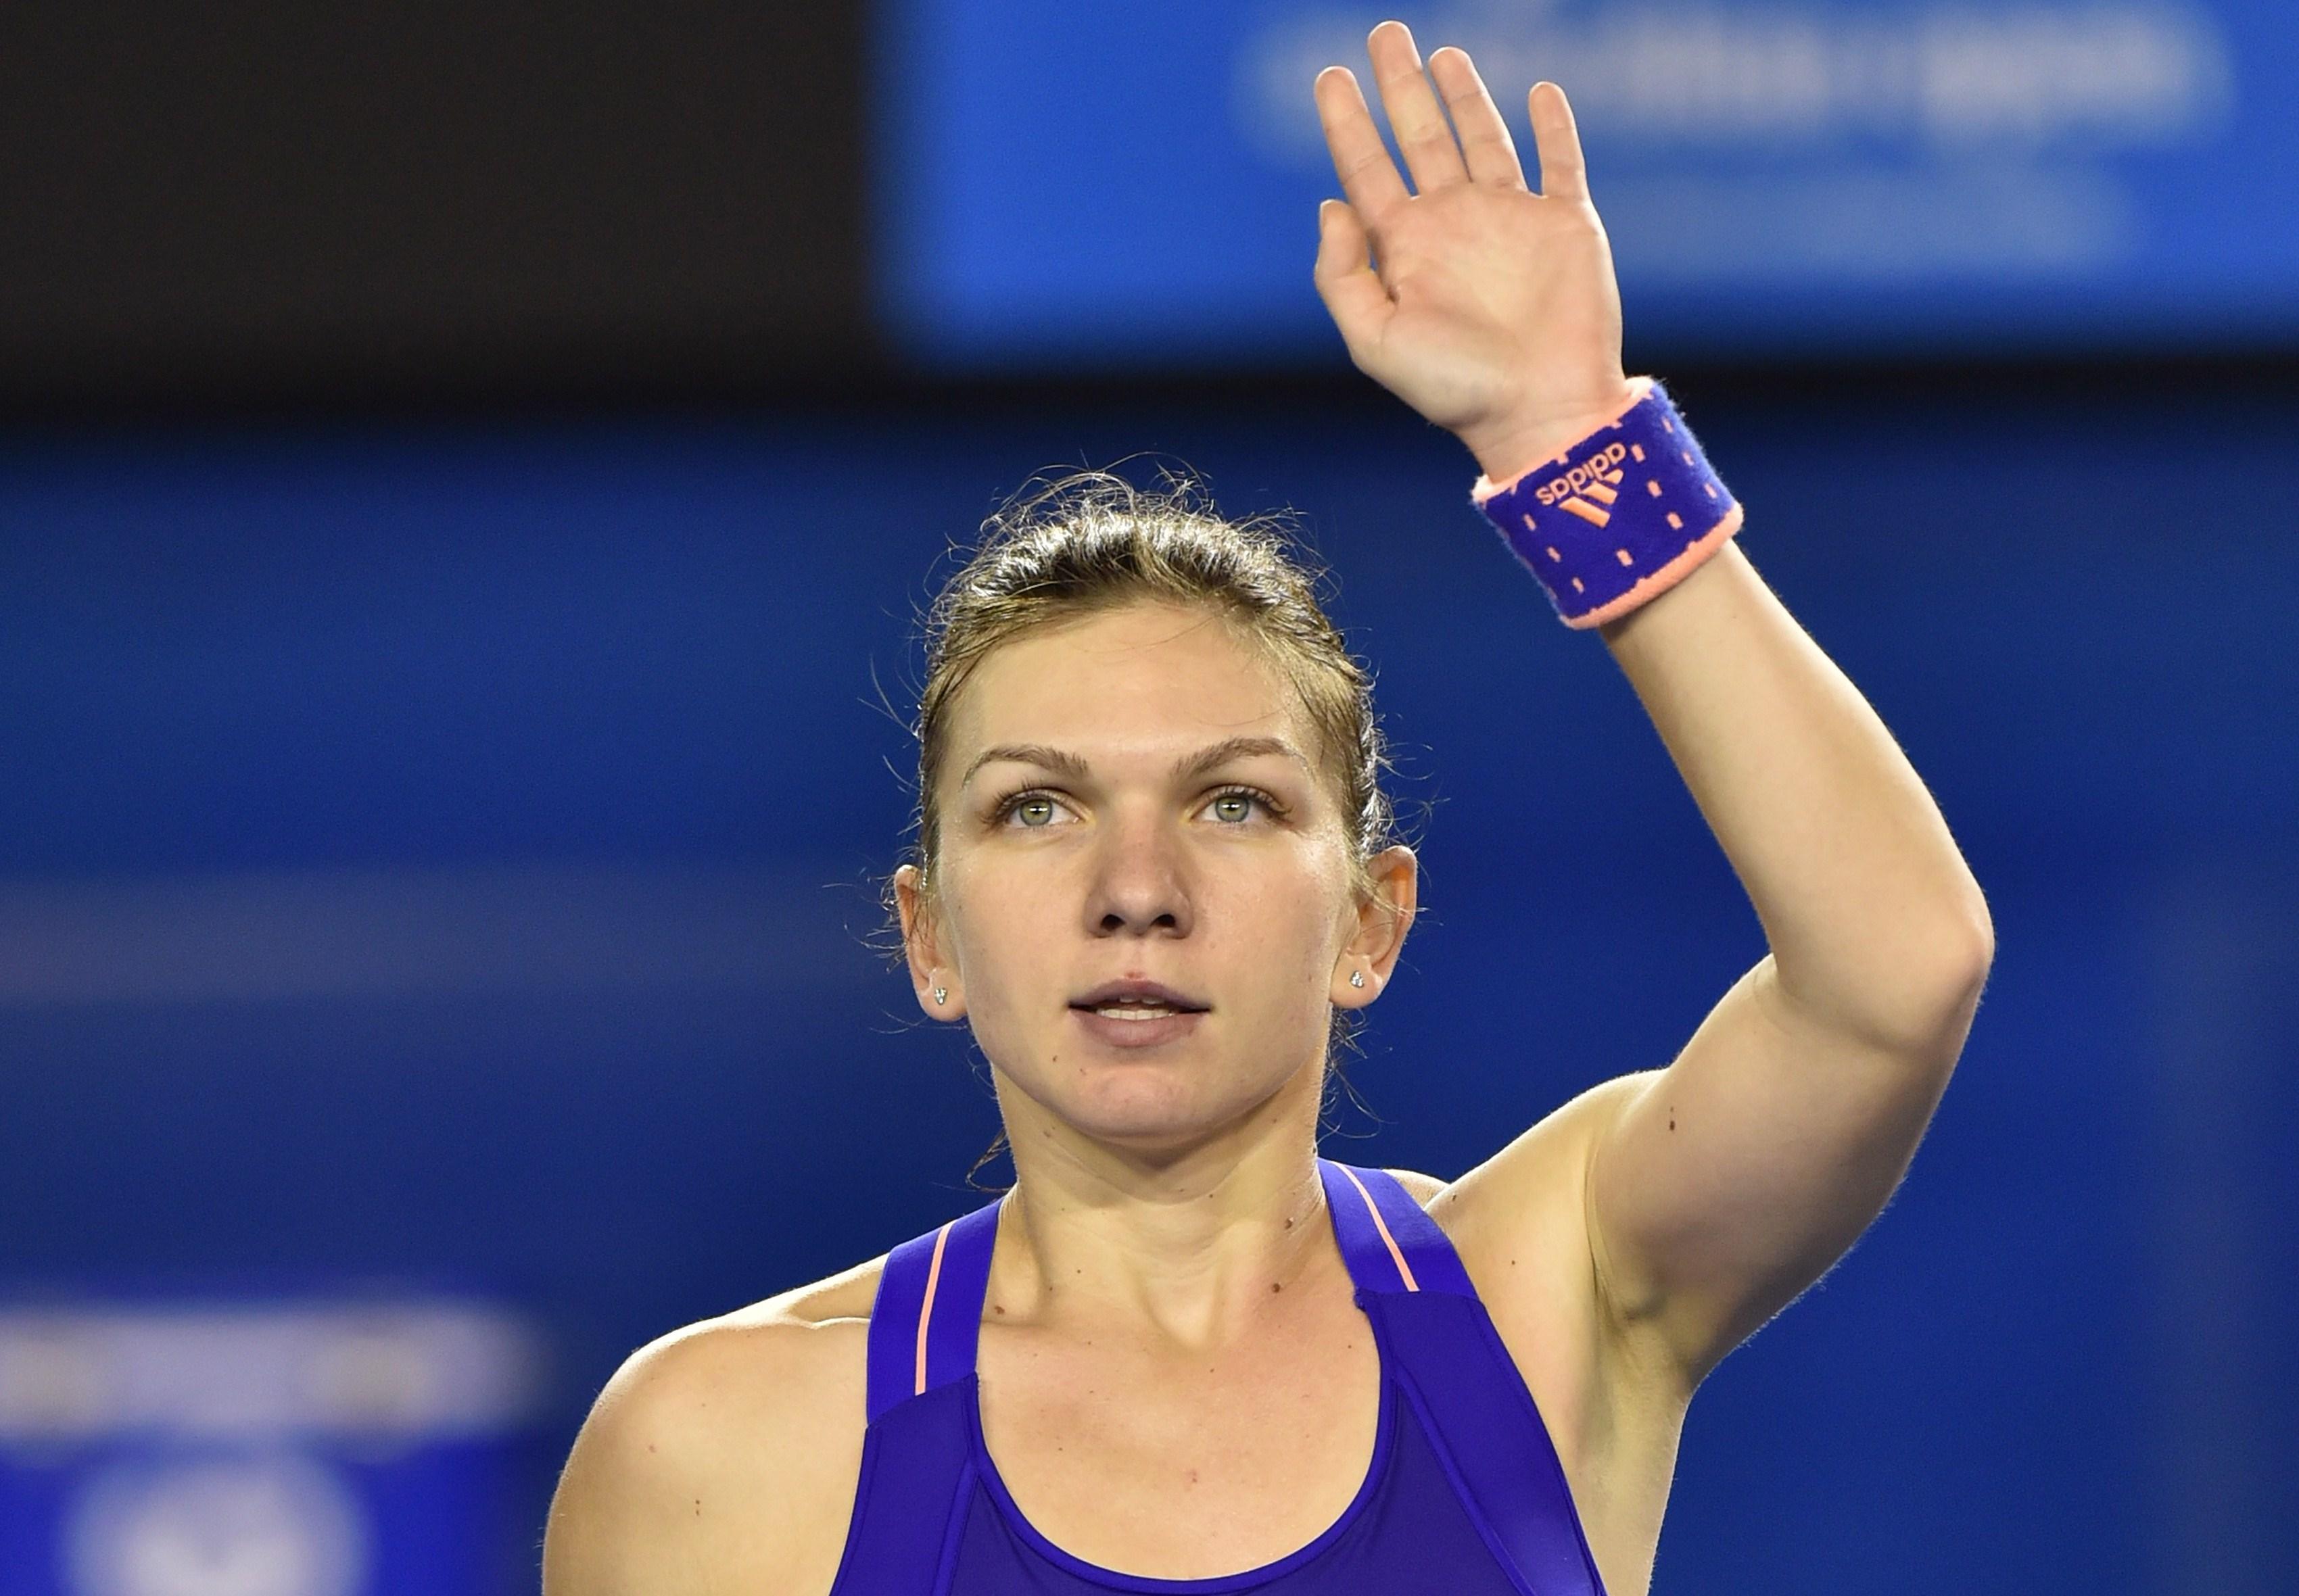 Halep a castigat primul meci, Irina Begu a fost invinsa in Fed Cup. Mesajul Simonei pentru Iohannis